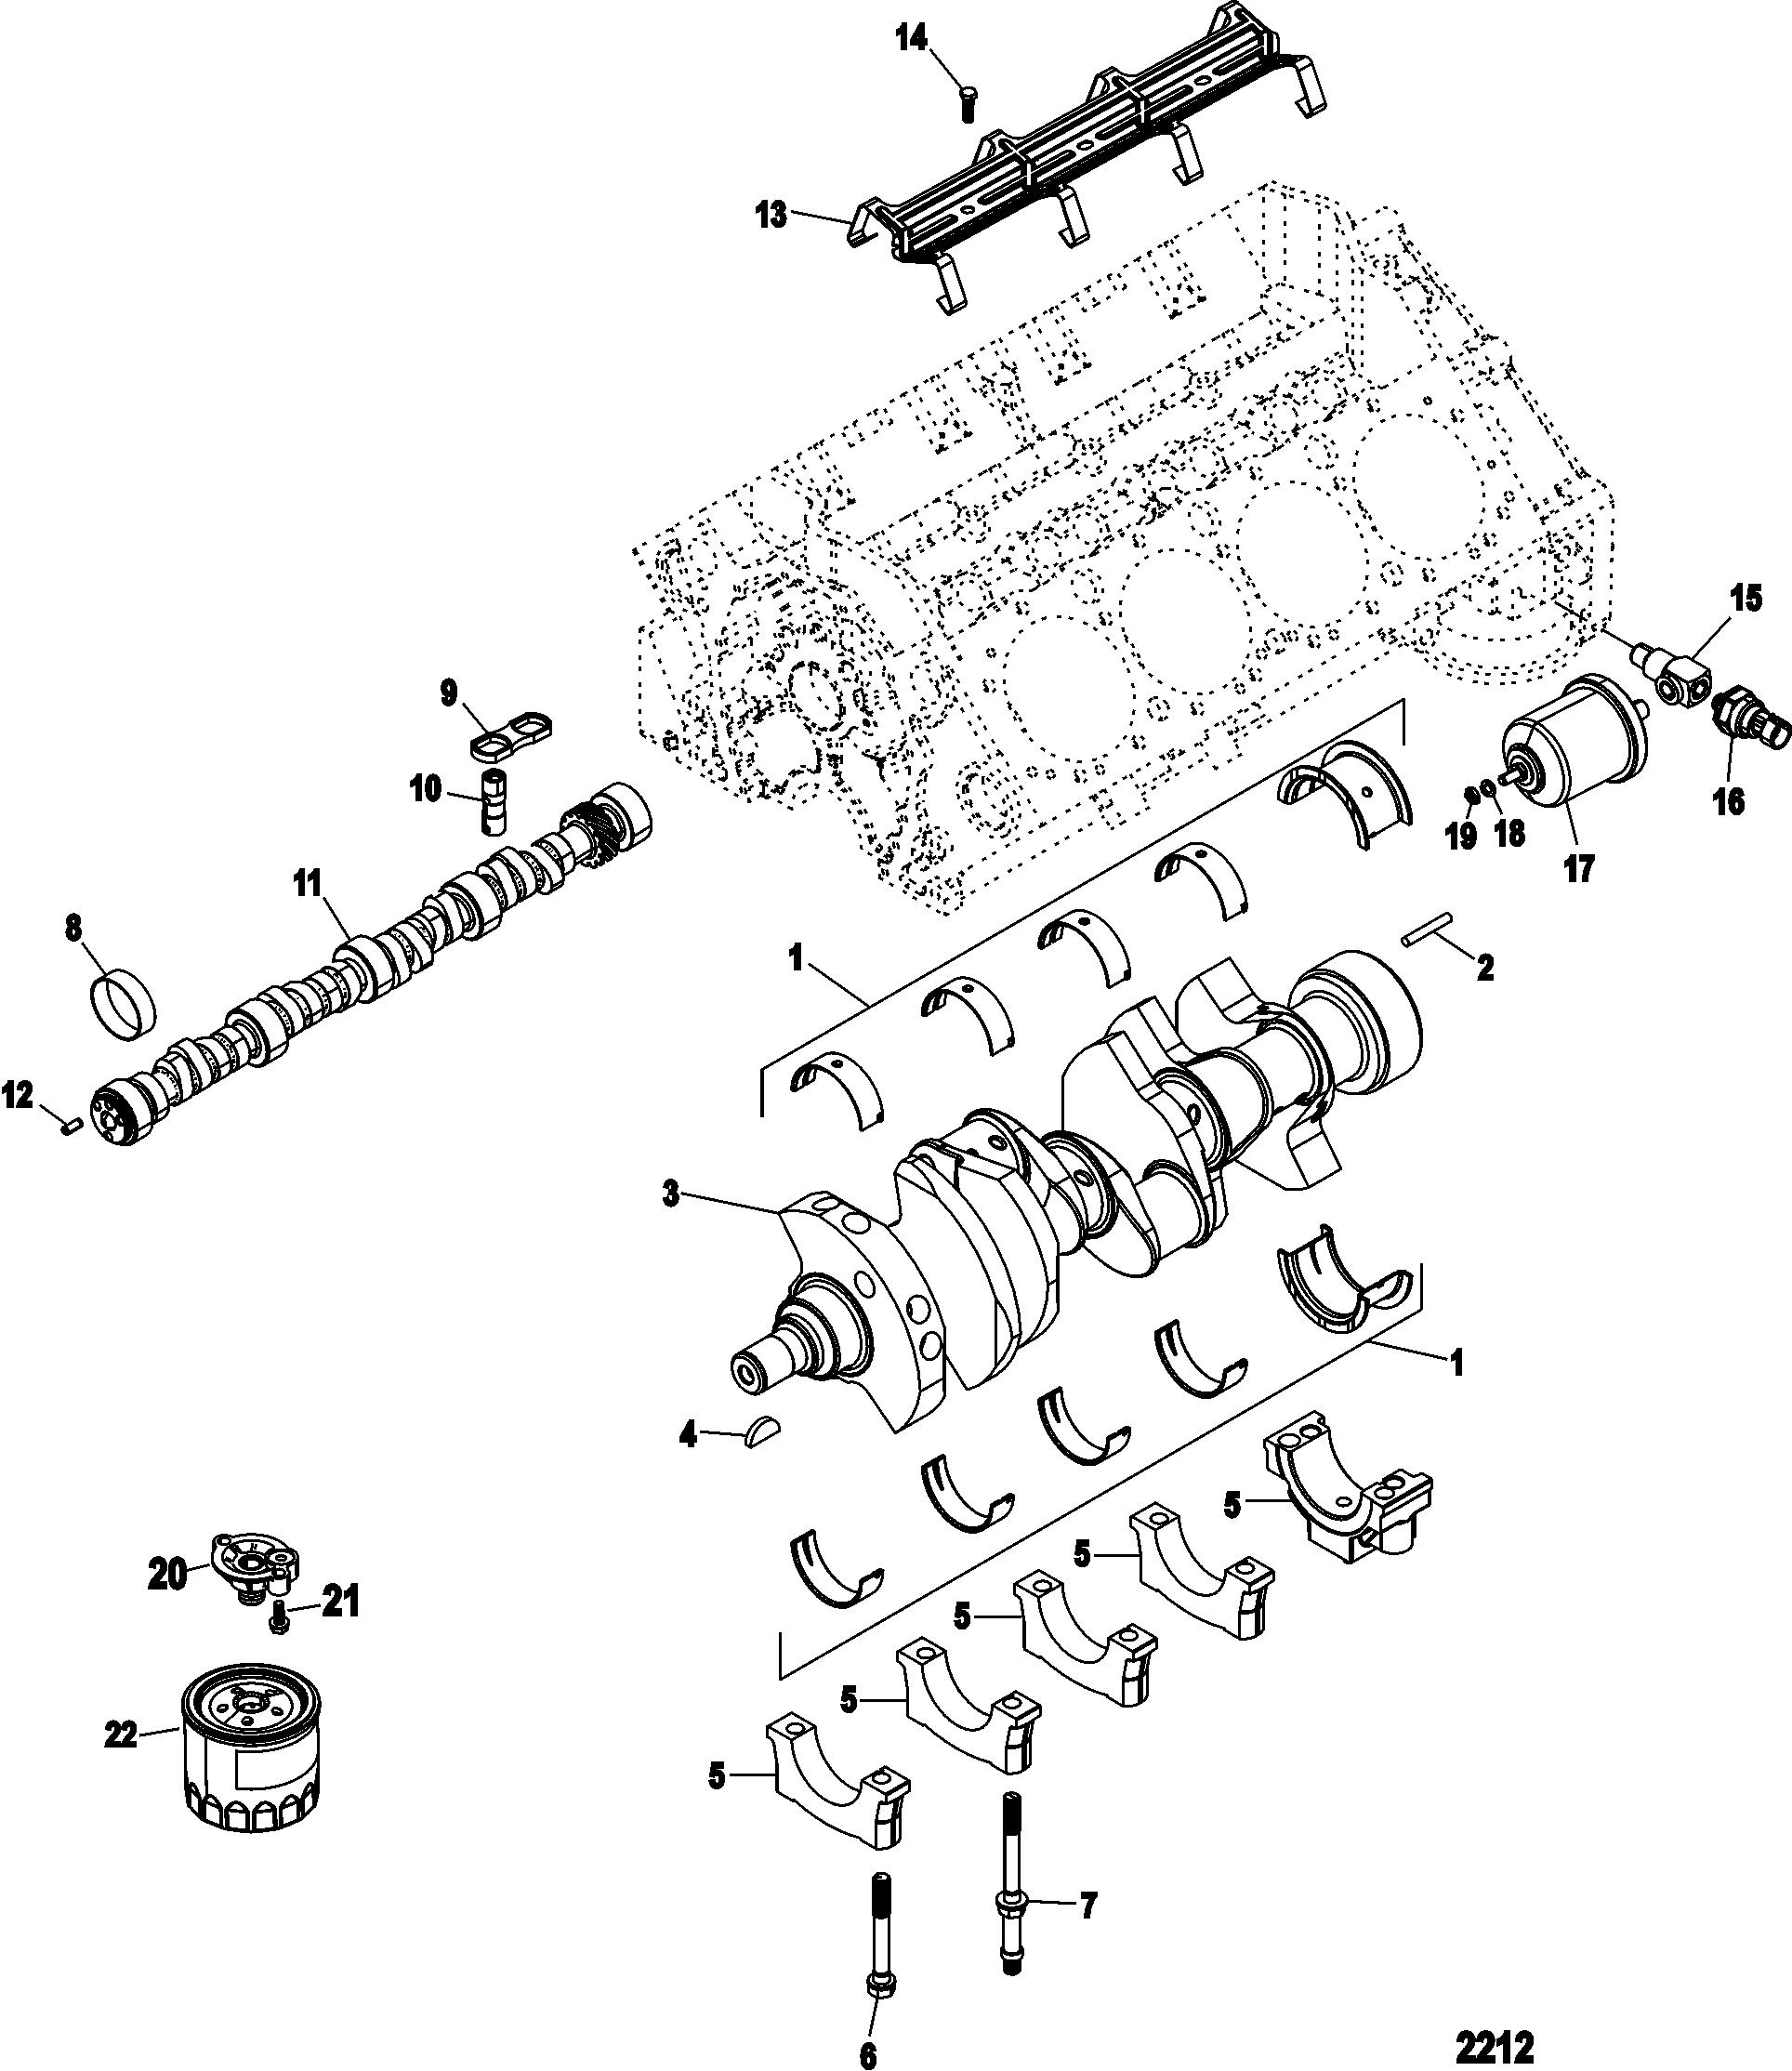 Cylinder Block, Camshaft and Crankshaft FOR MISCELLANEOUS